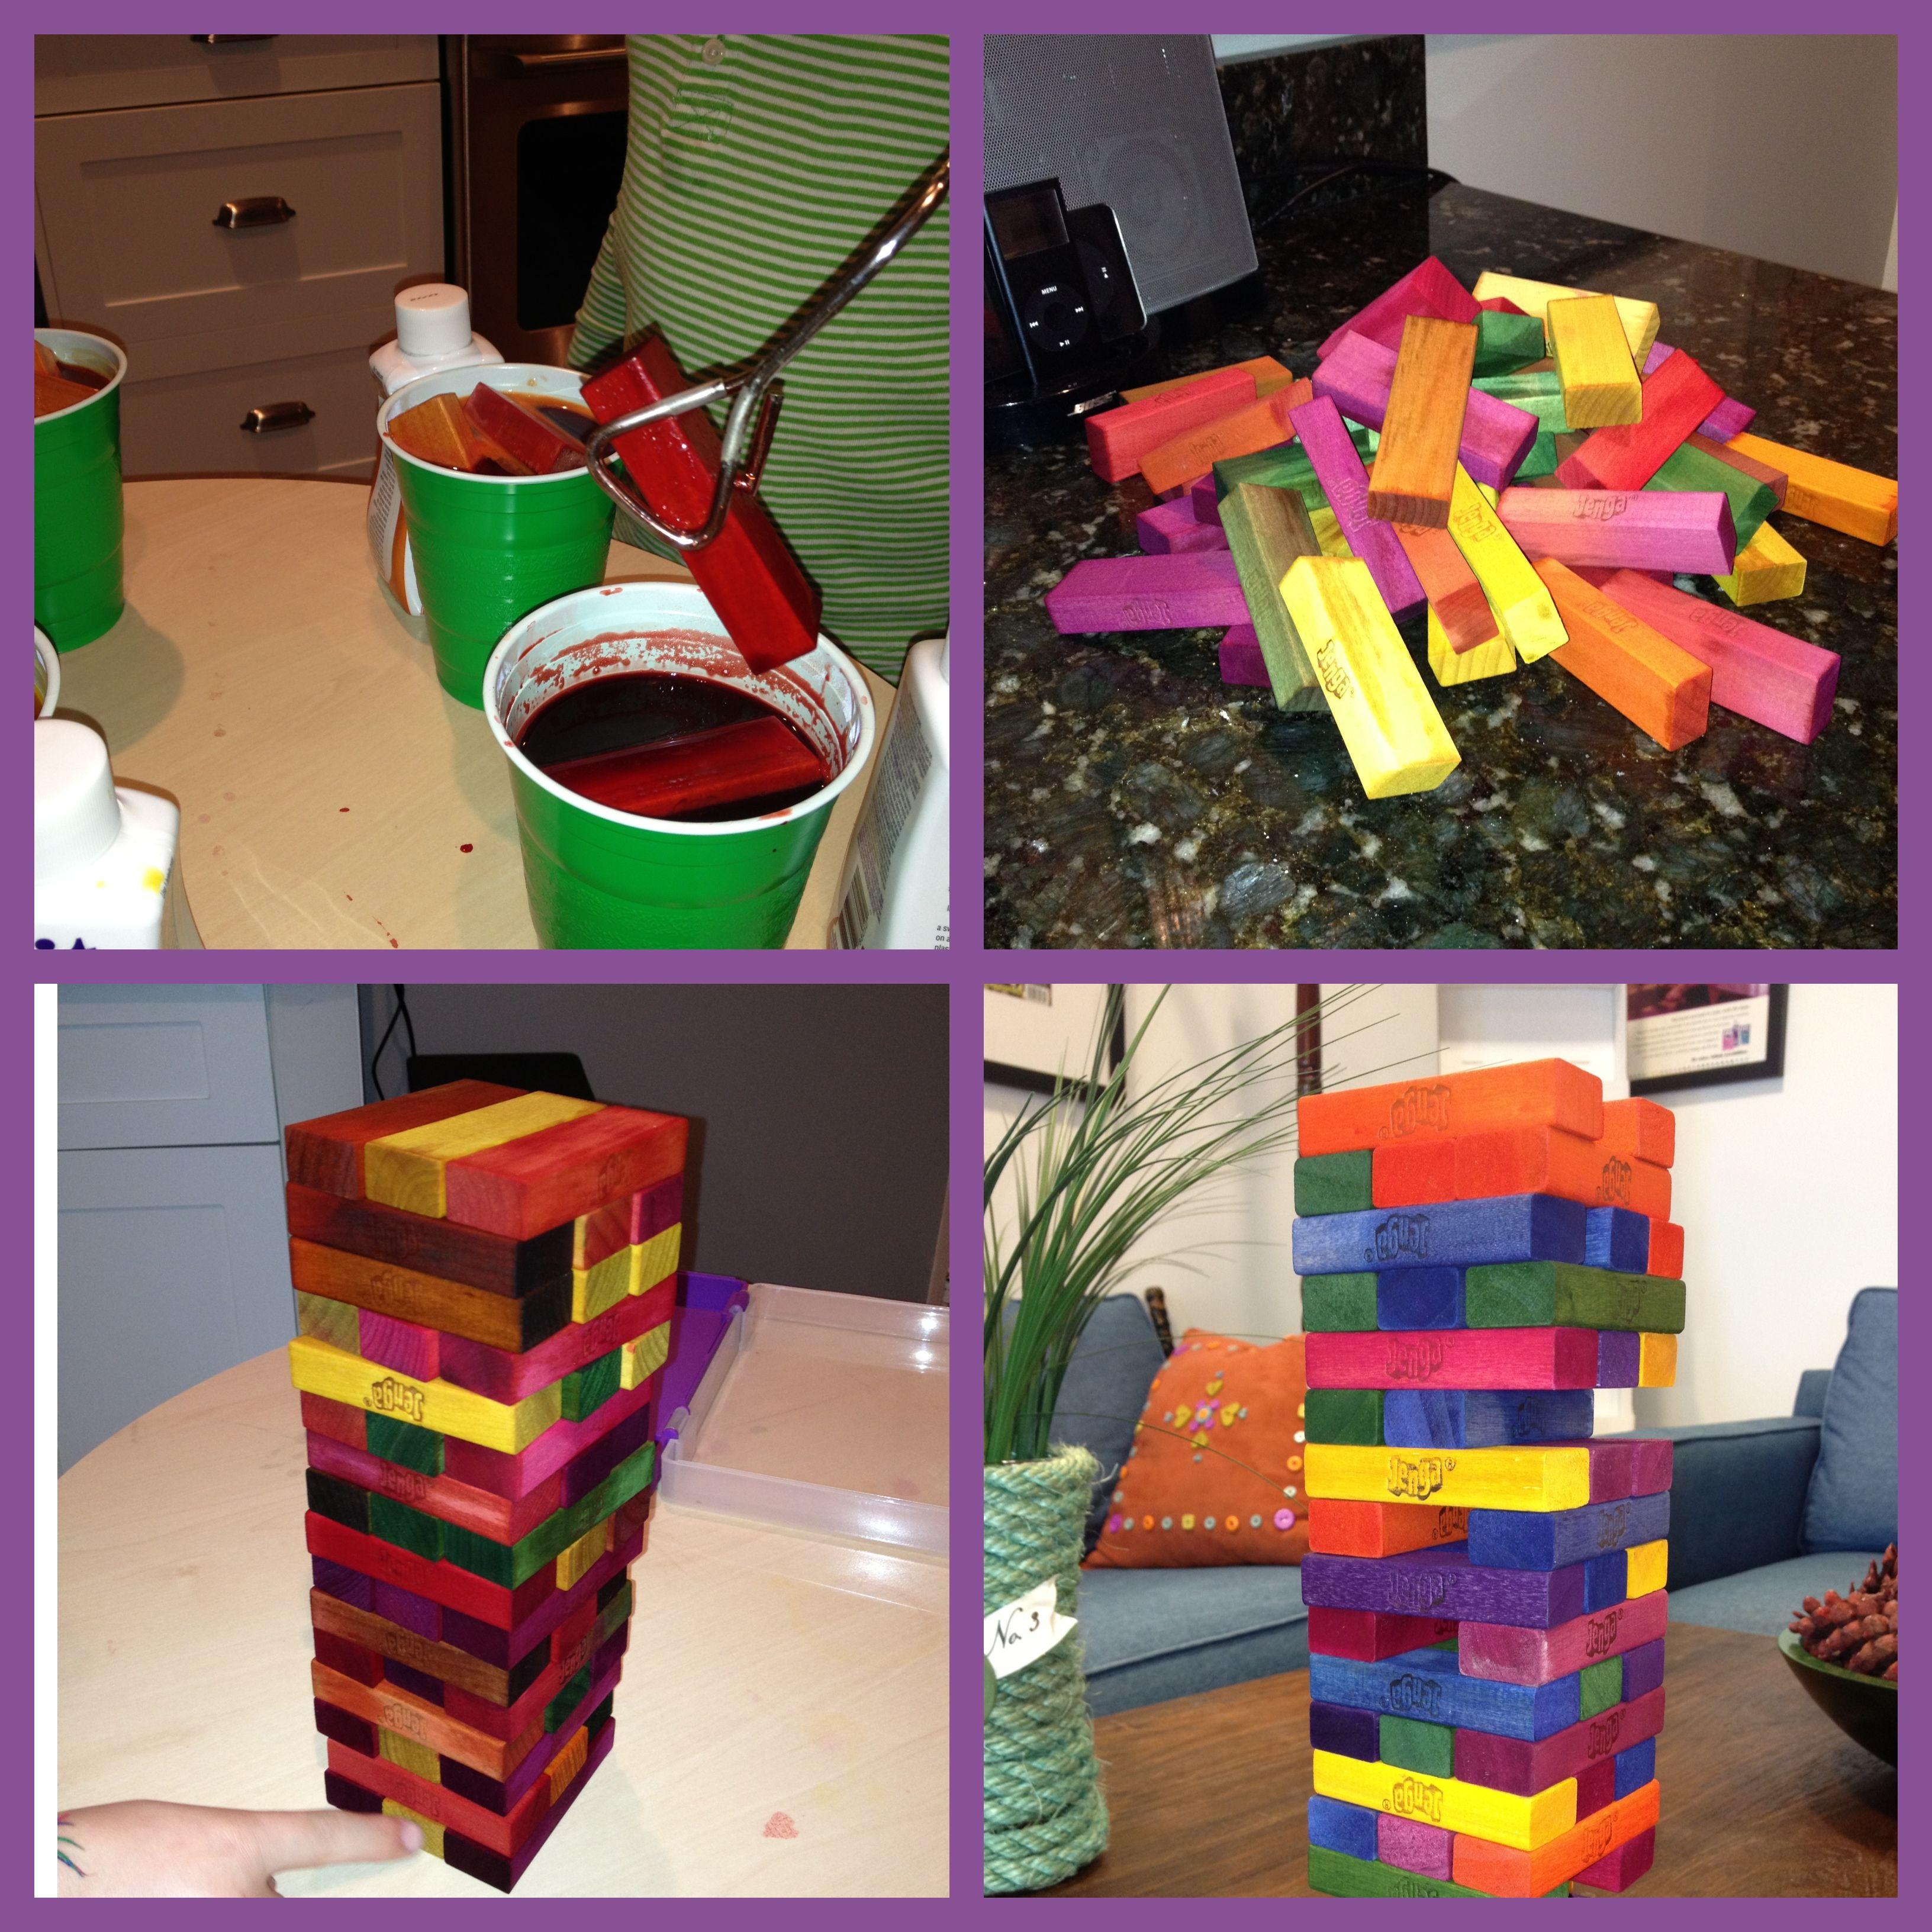 Add a little flare to jenga blocks with rit ritdye reception add color to a jenga set with rit dye nvjuhfo Image collections